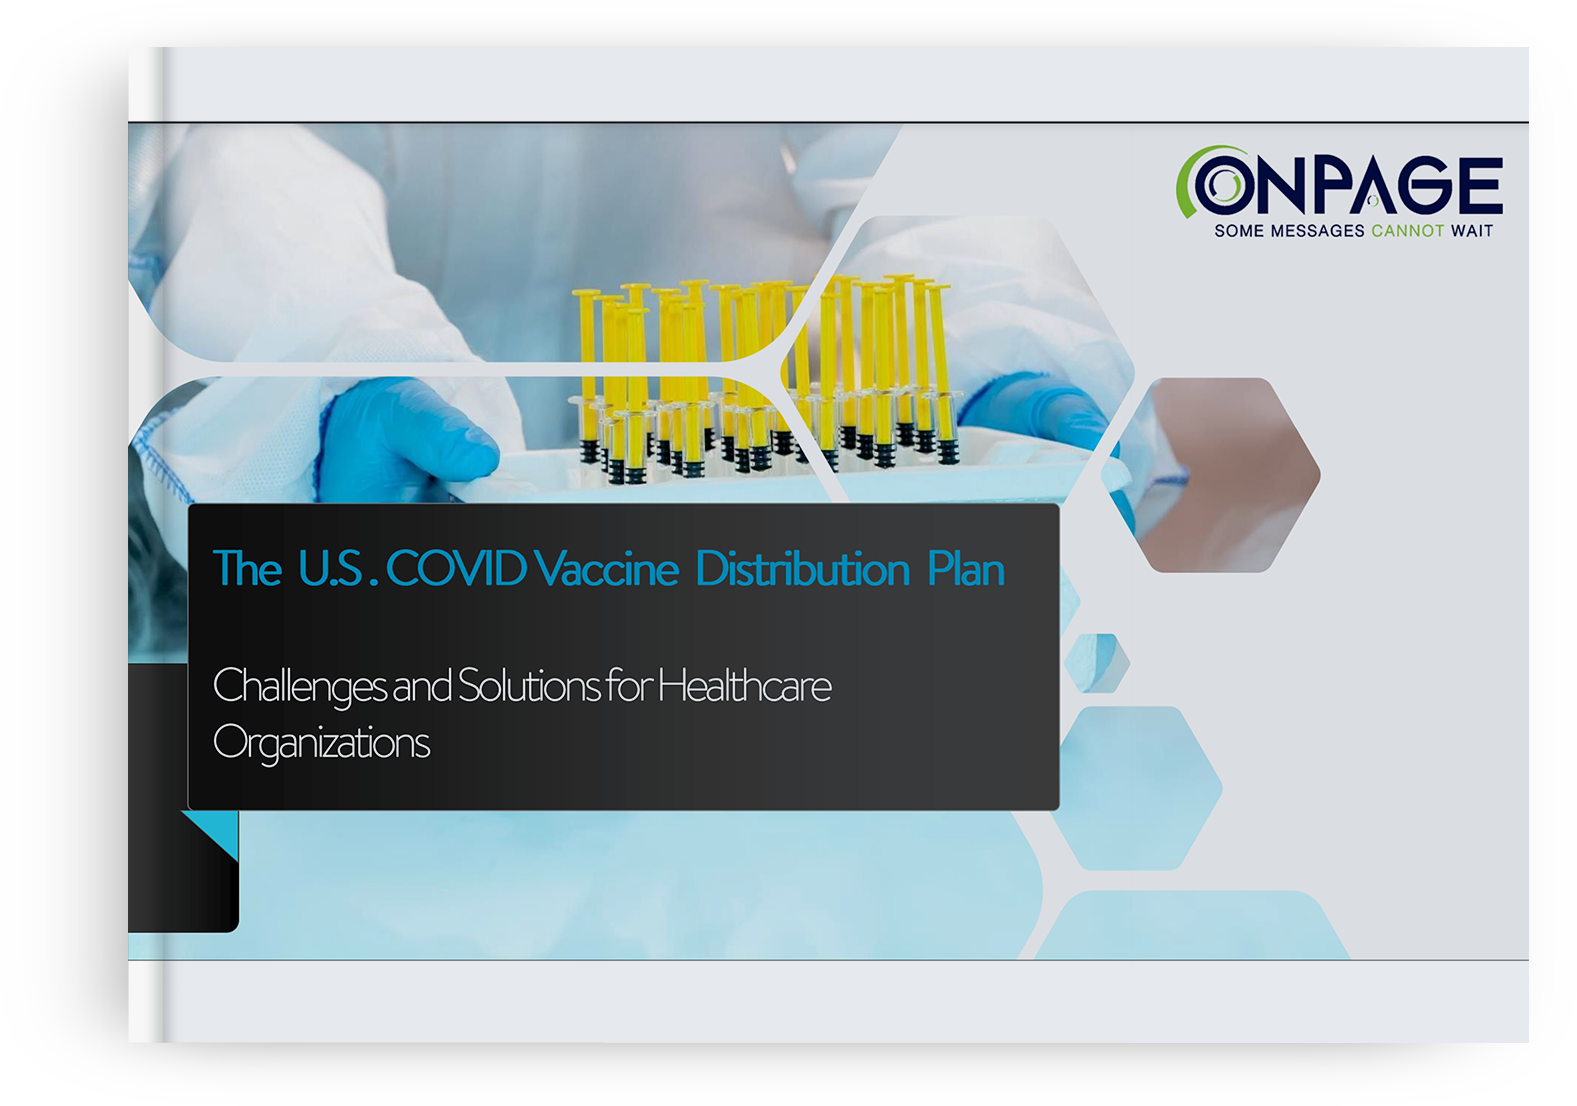 COVID vaccine distribution plan